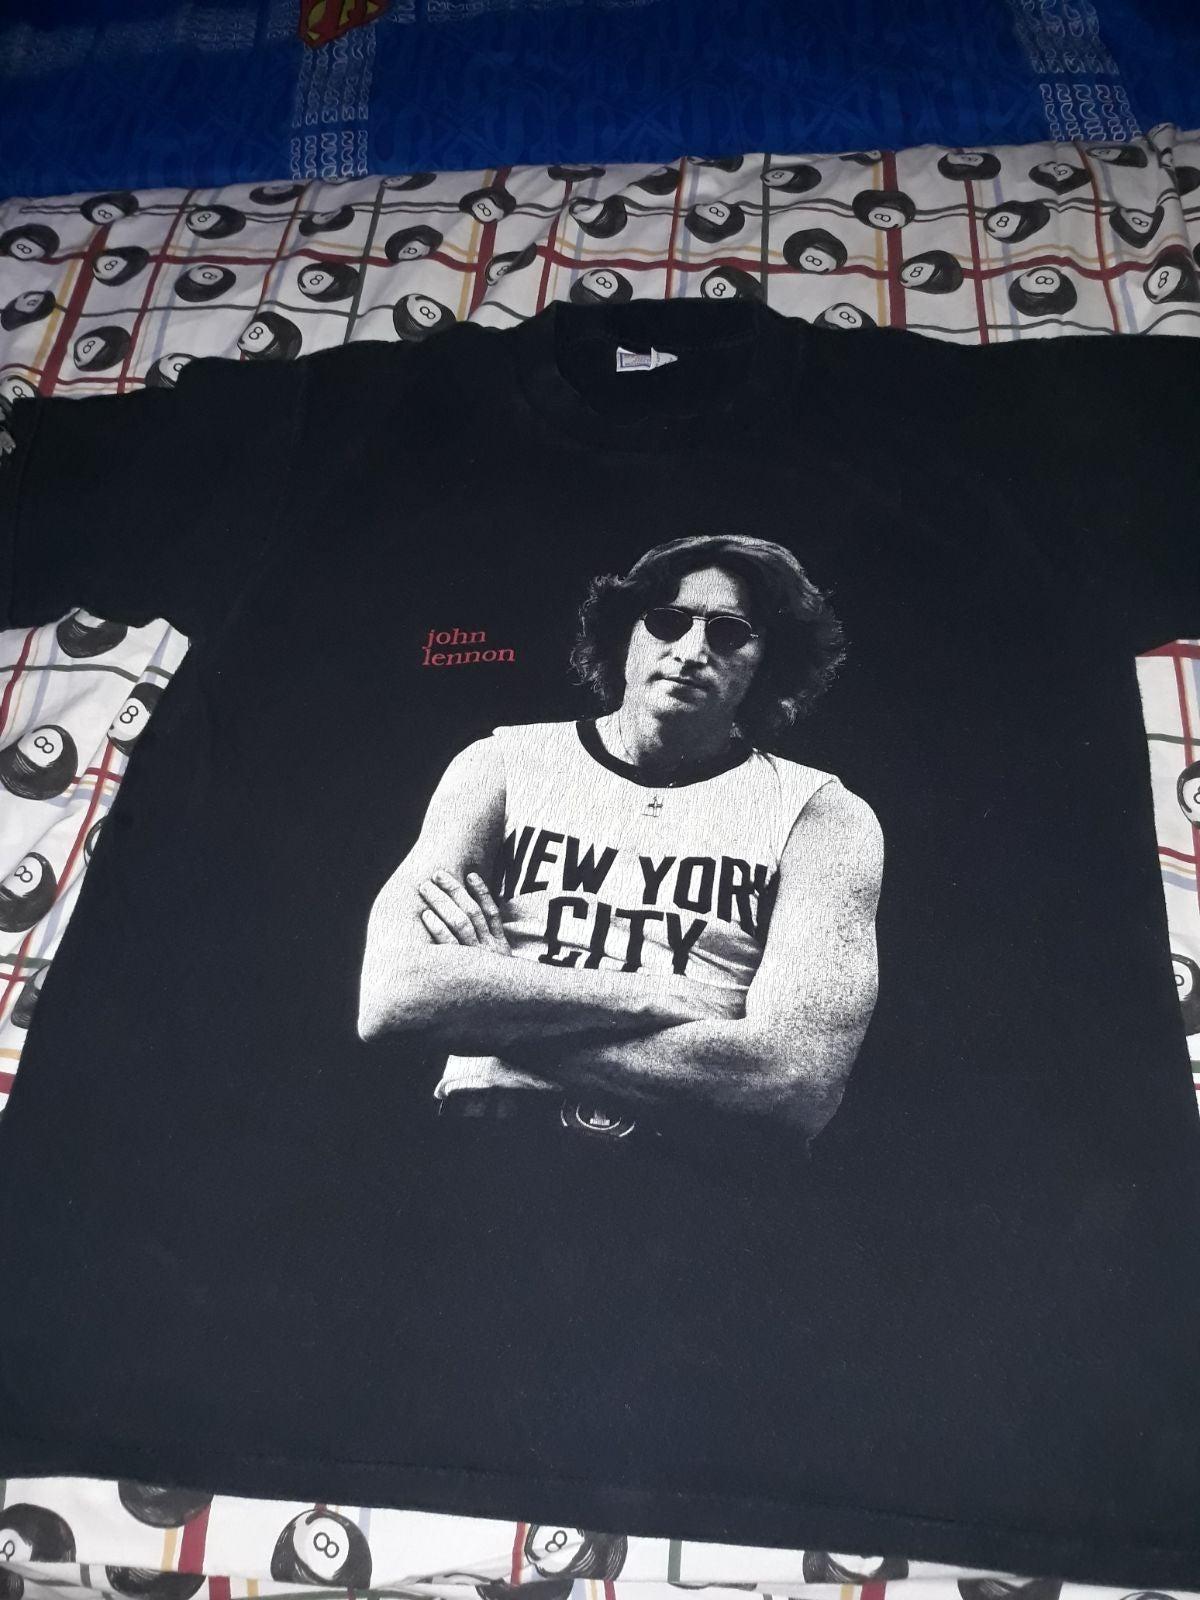 Vintage John Lennon shirt